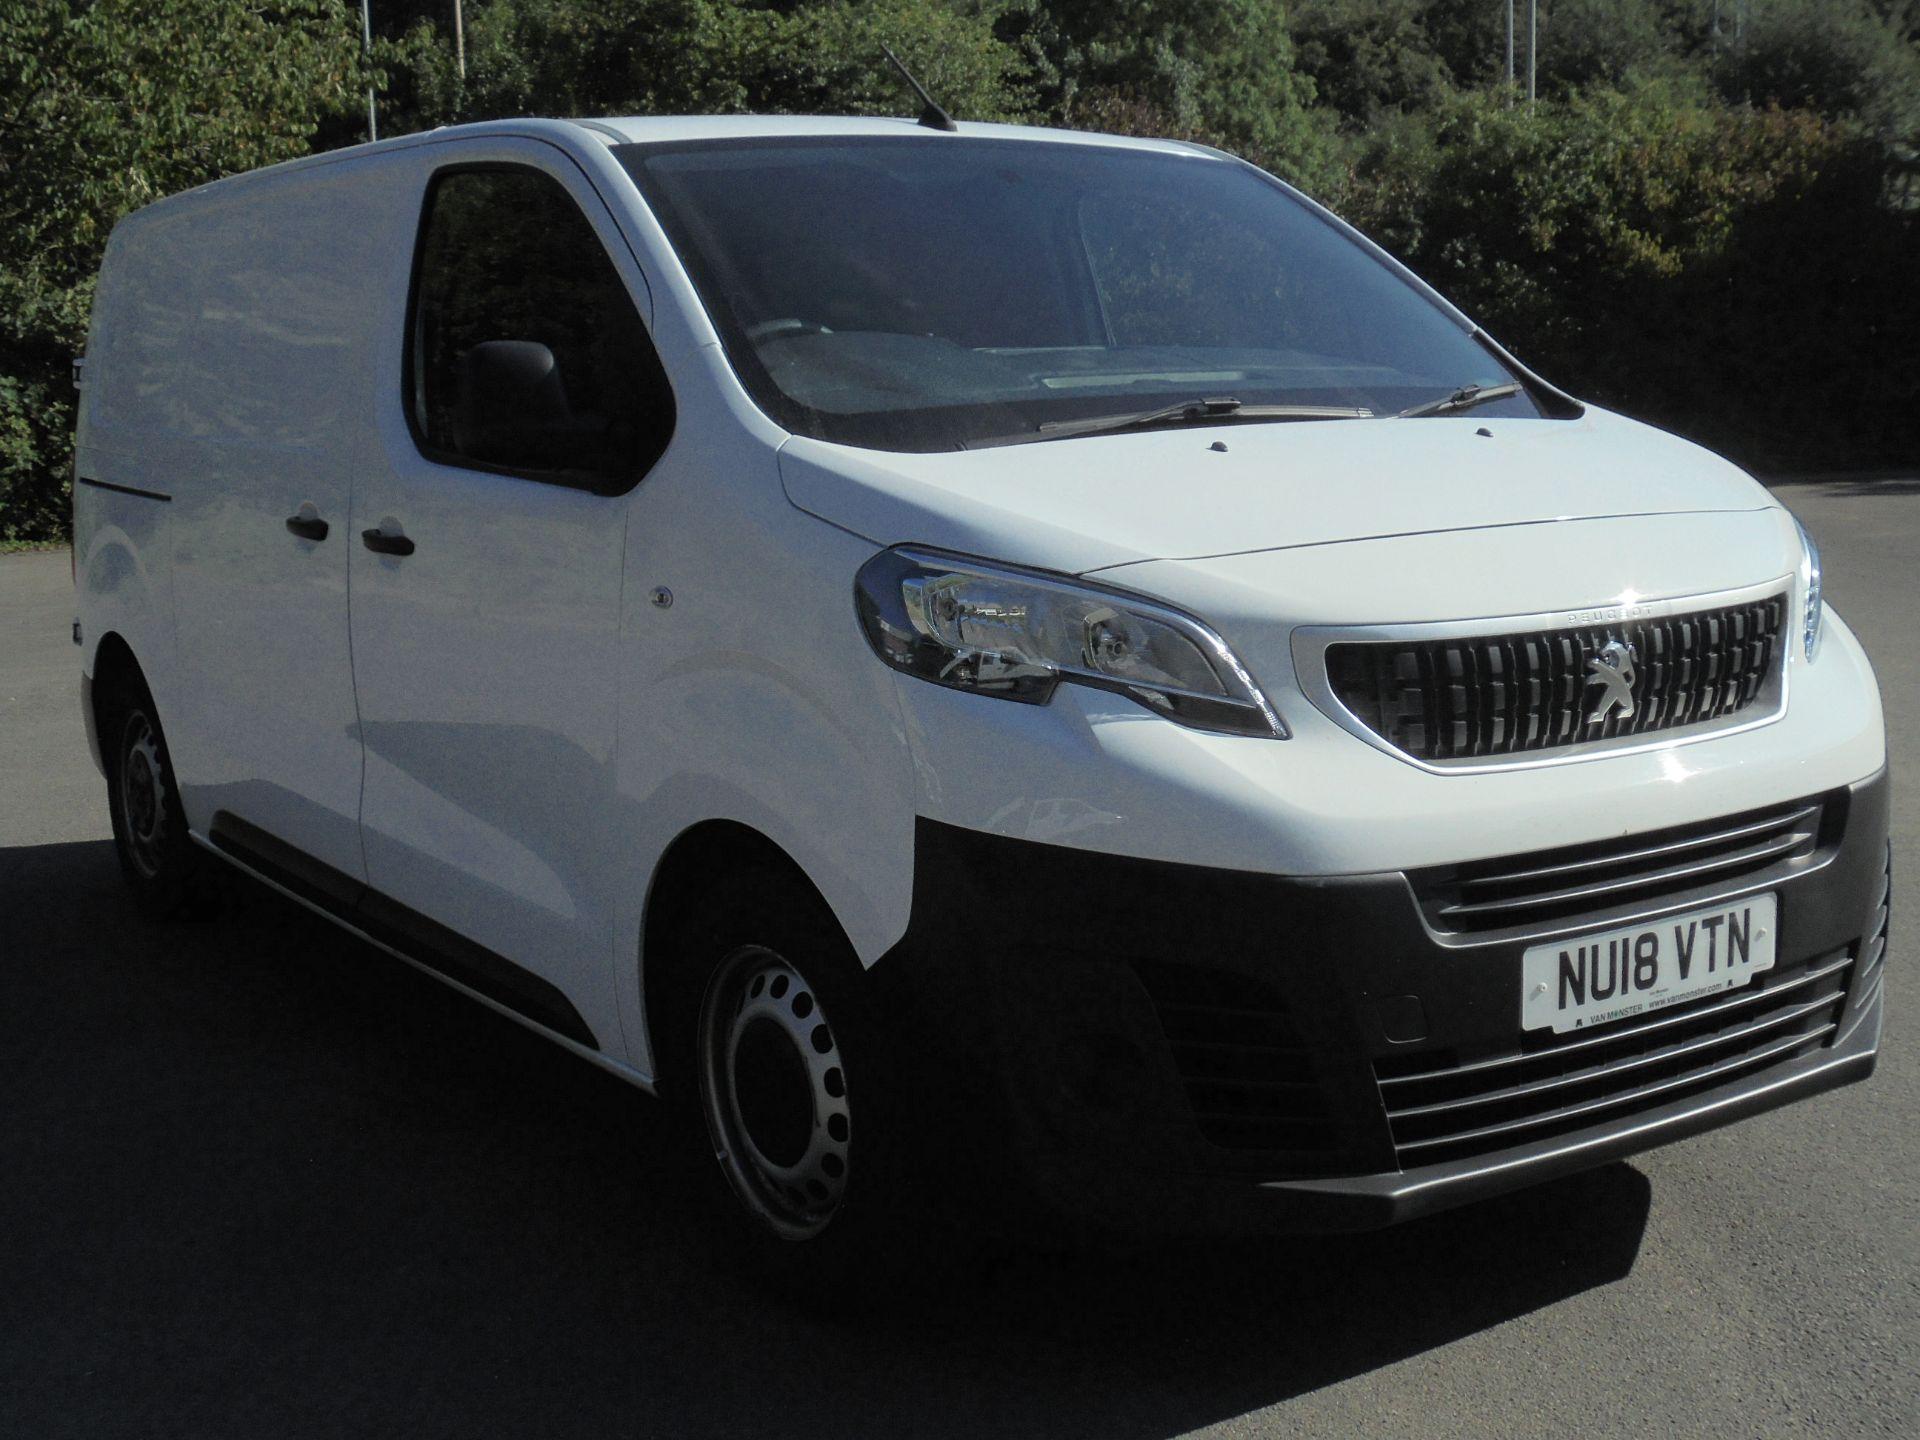 2018 Peugeot Expert 1000 1.6 Bluehdi 95 S Van (NU18VTN)